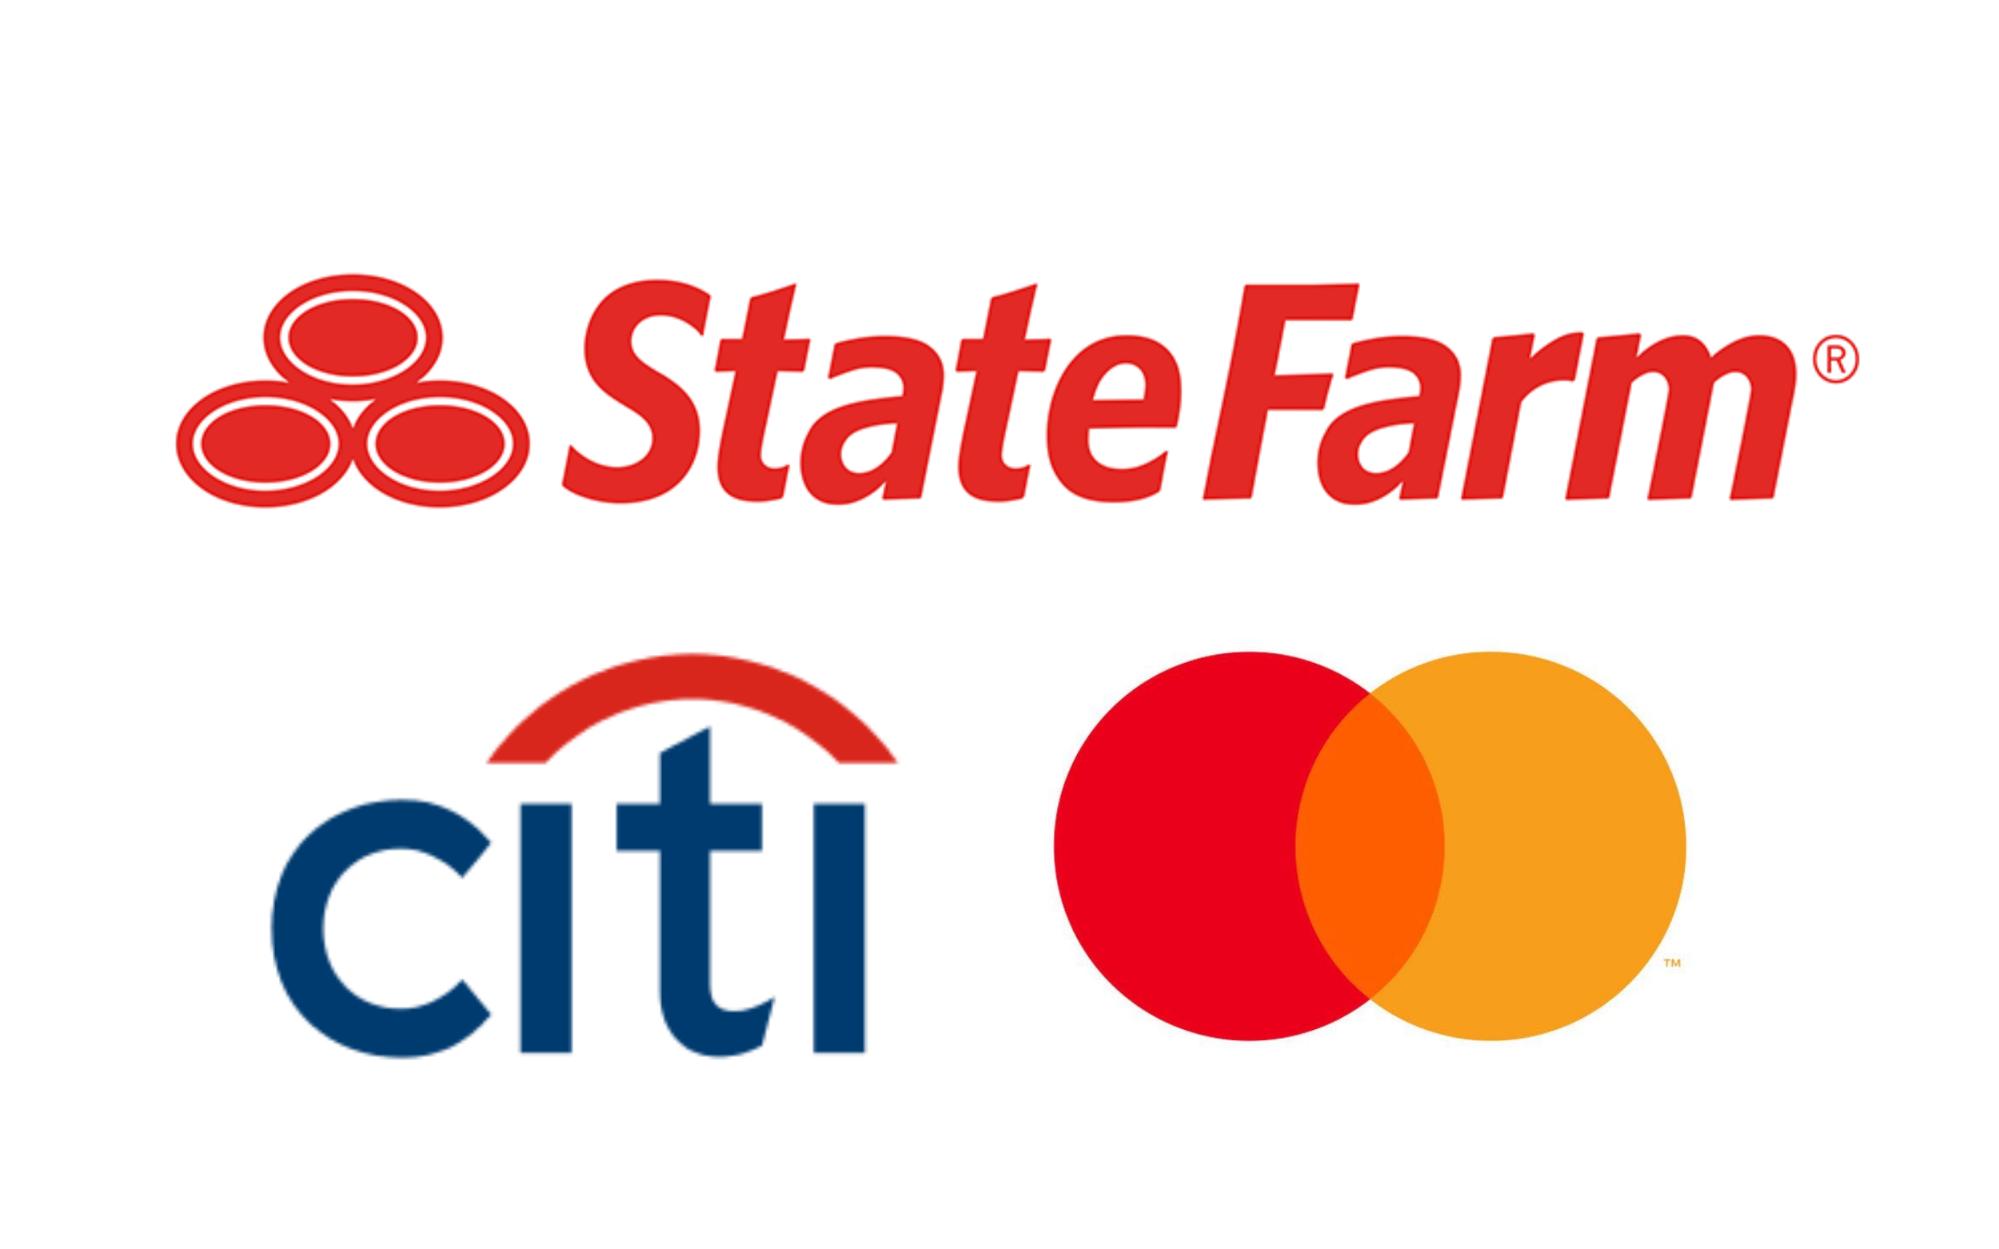 finance logos - anatomy of a killer logo by venngage | brafton